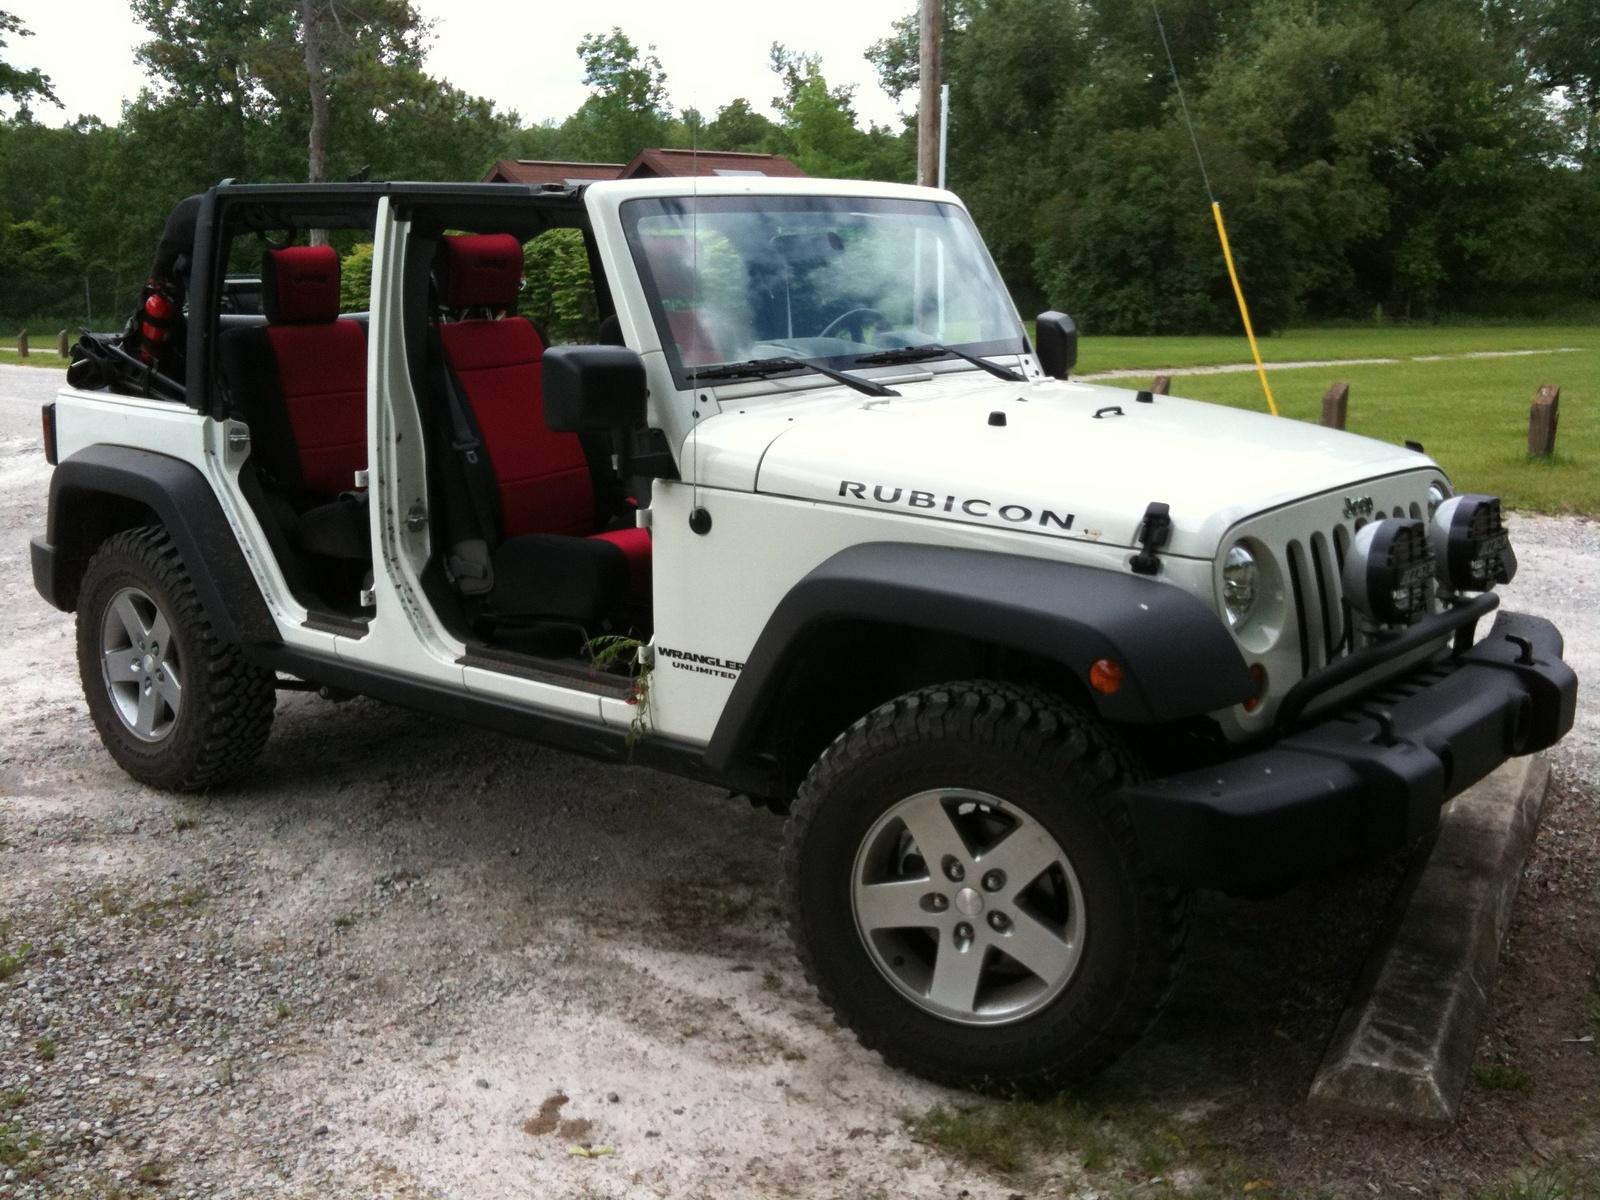 2010 jeep wrangler pictures cargurus. Black Bedroom Furniture Sets. Home Design Ideas